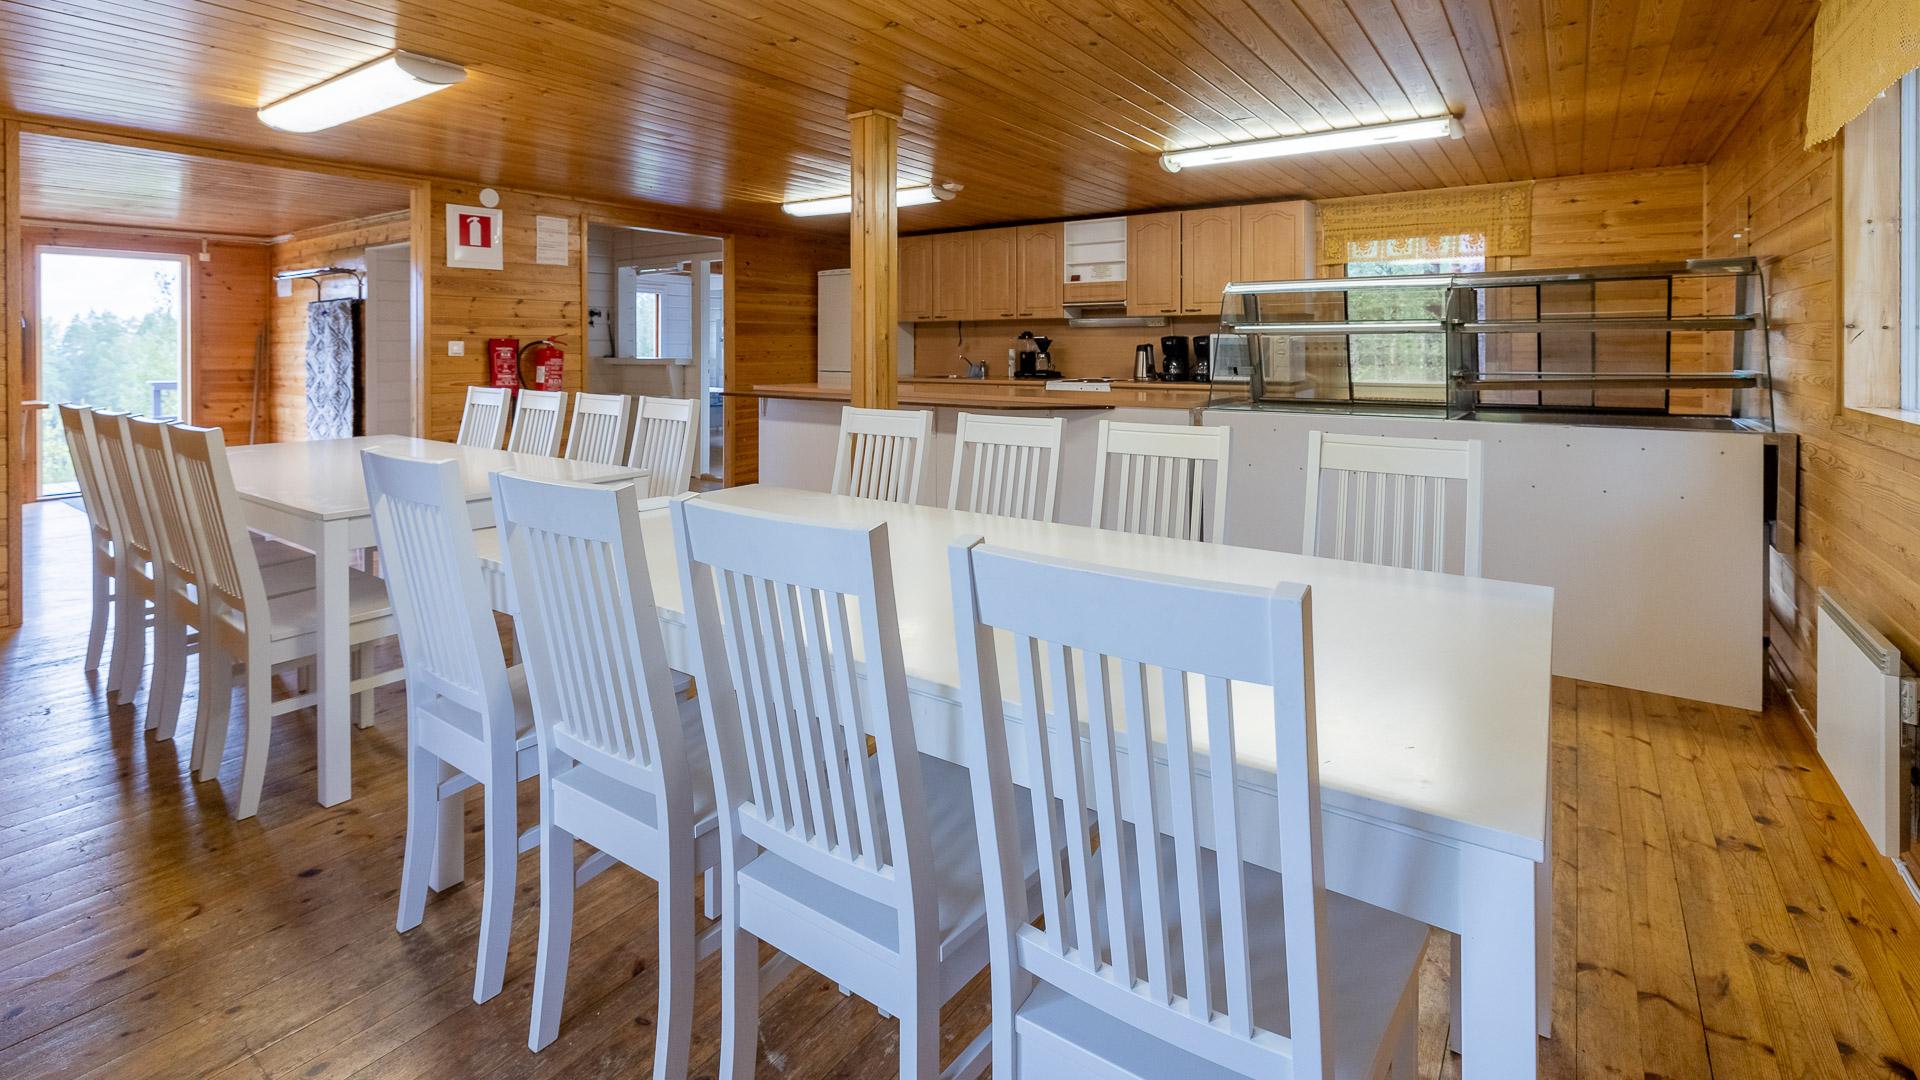 Niinimaja ruokailutila Jämijärvi